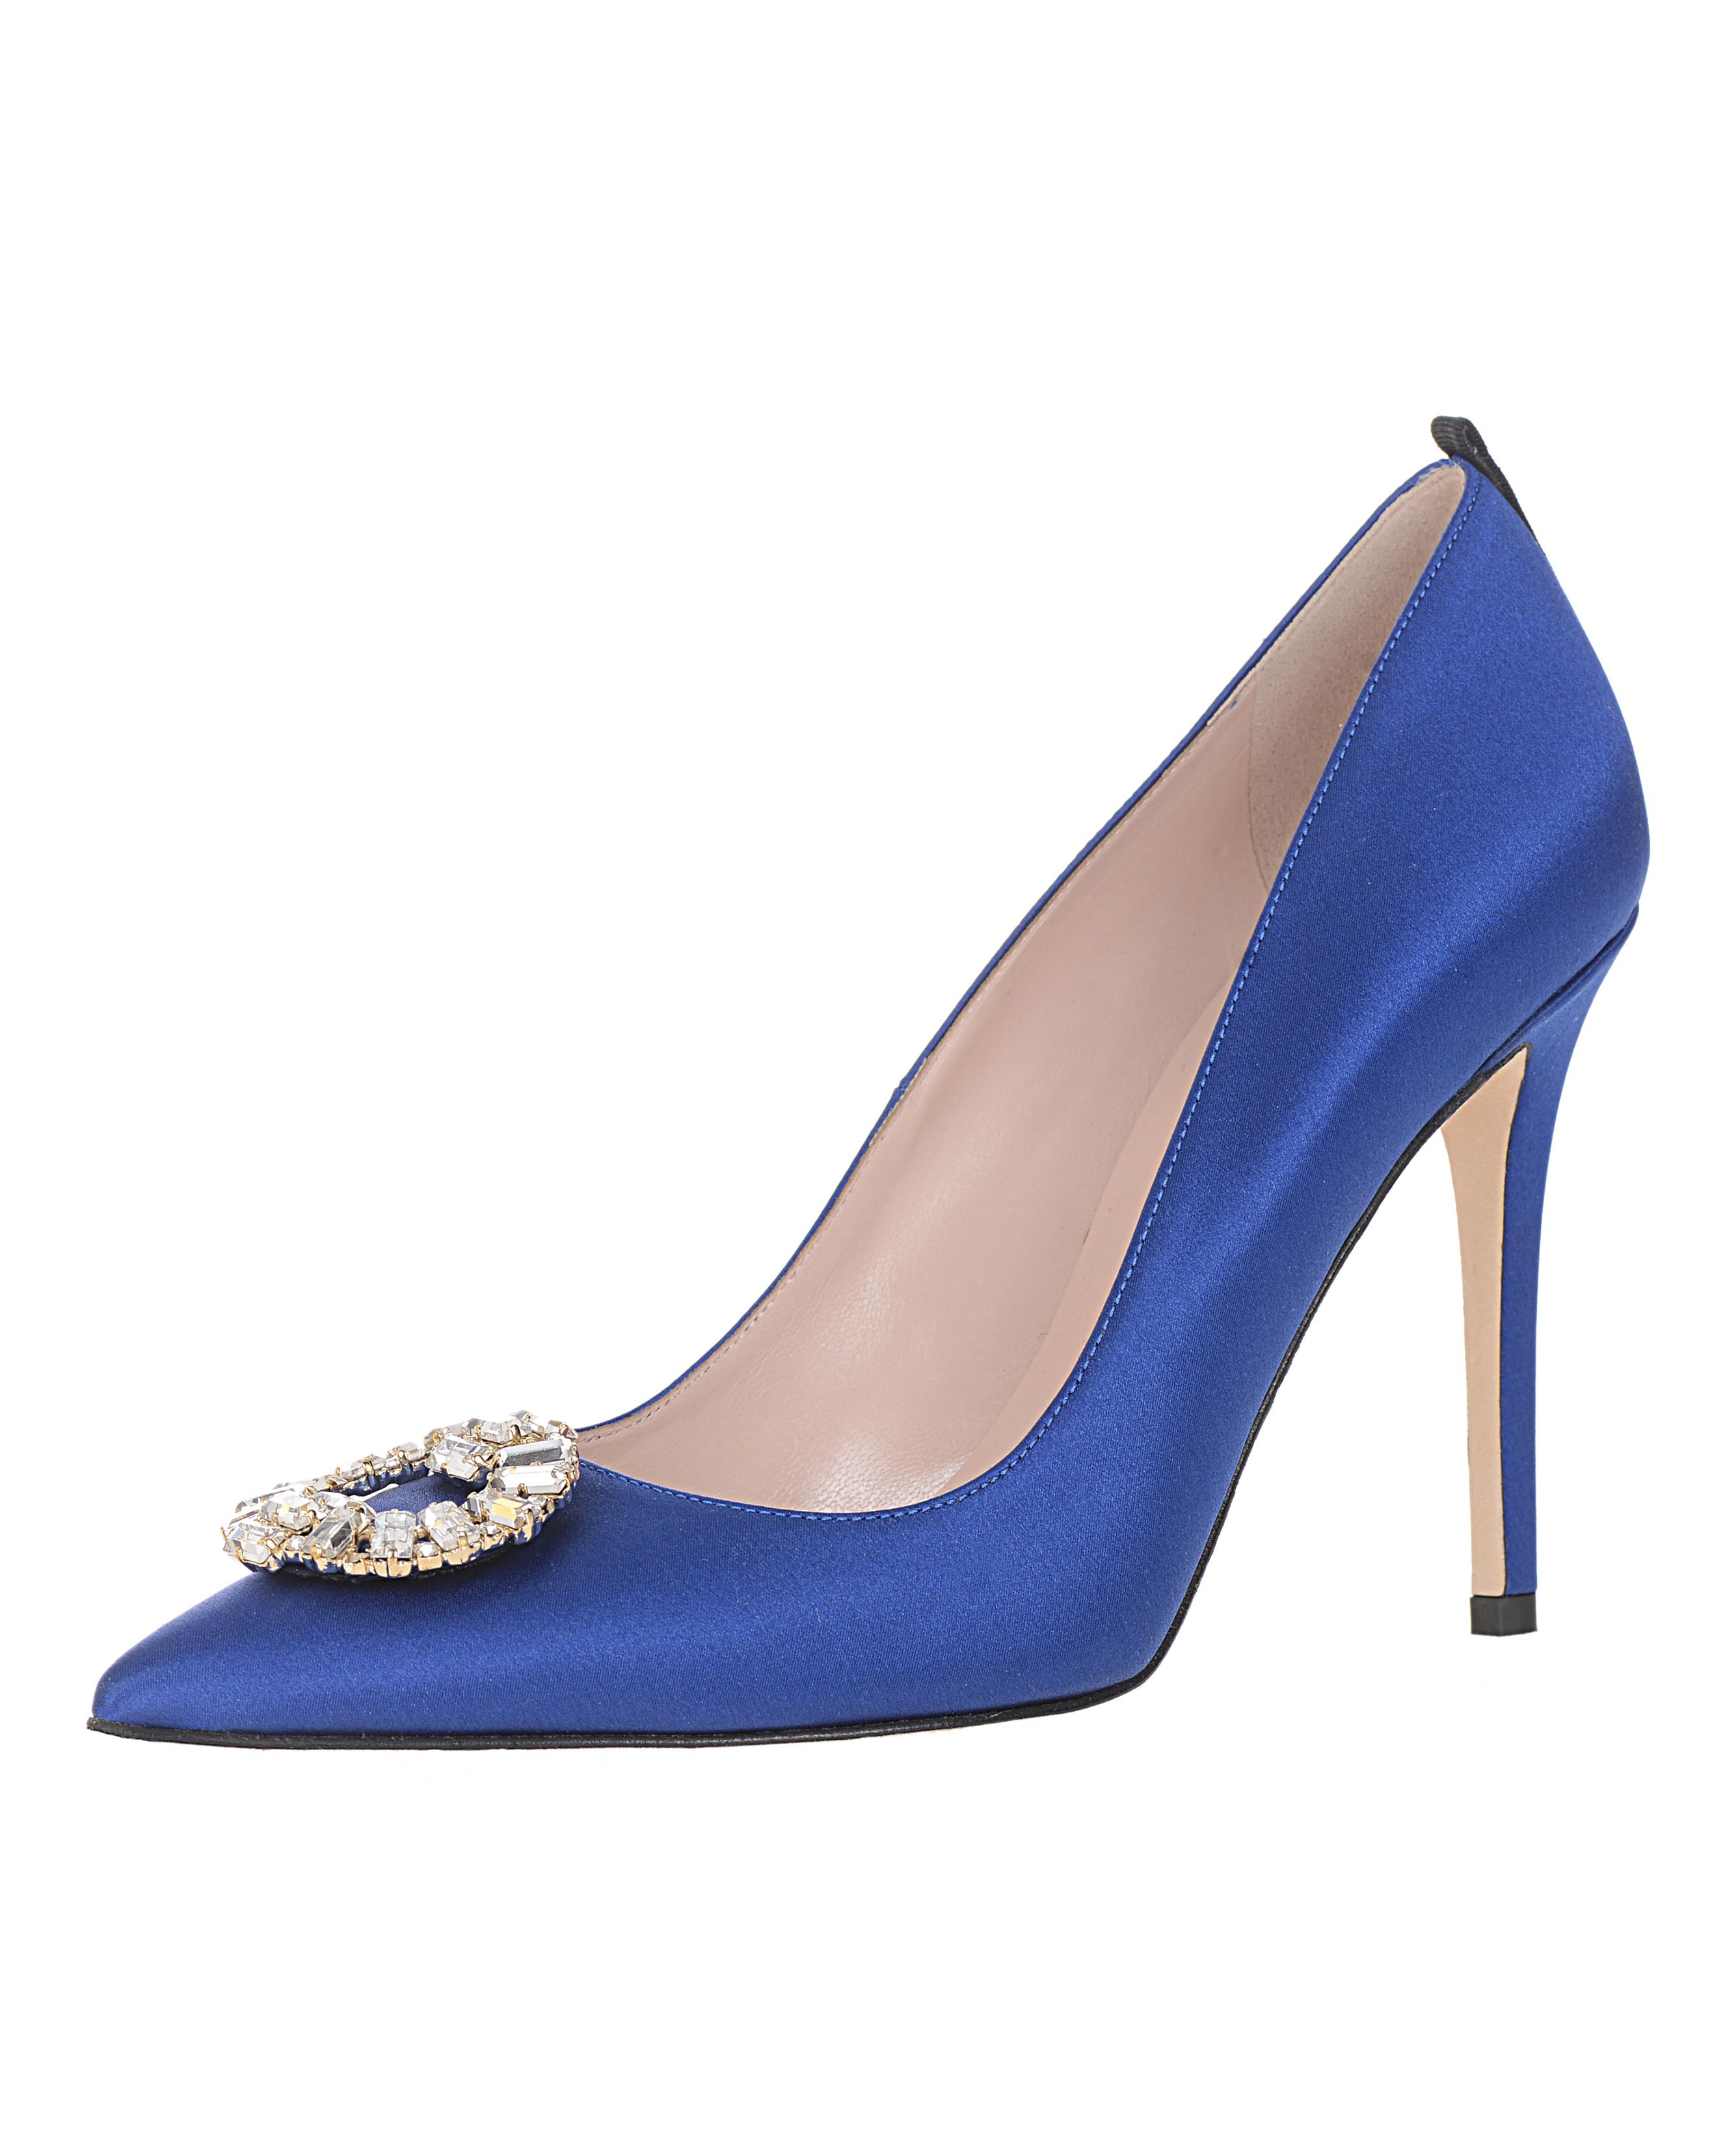 sjp-bridal-shoe-maddalena-update-0515.jpg